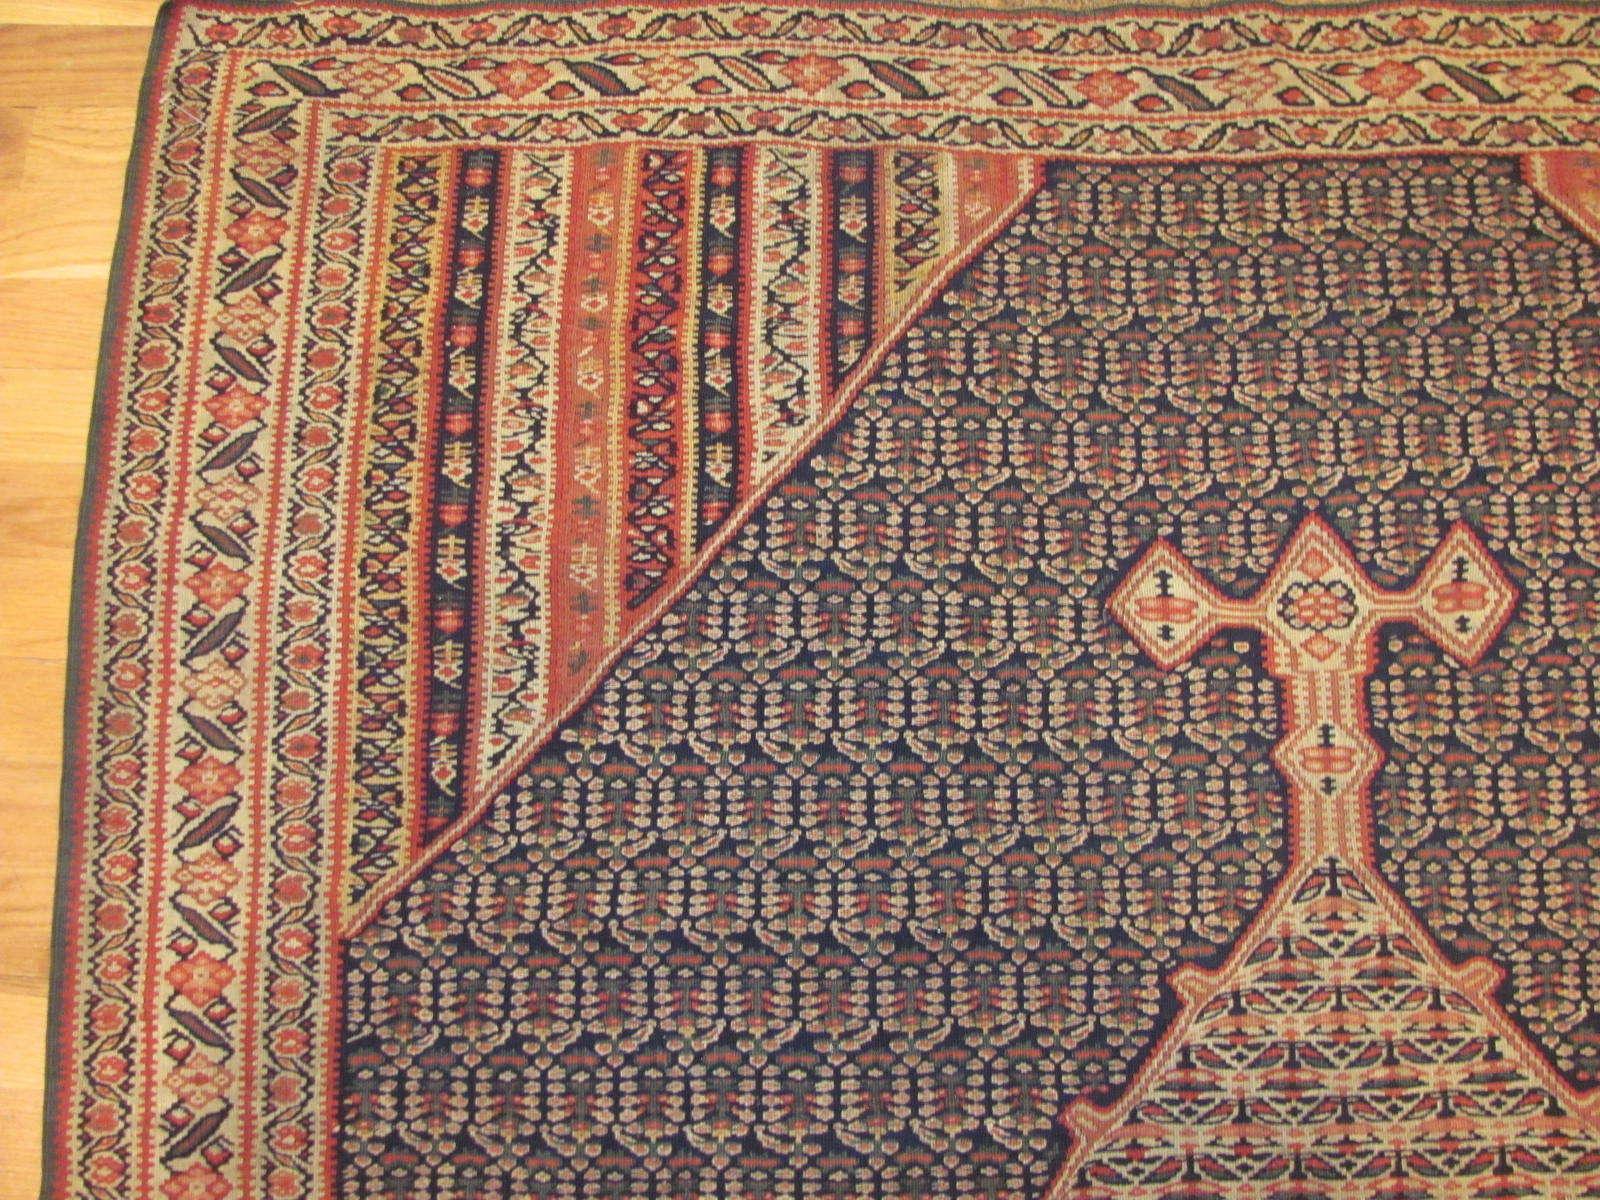 24874 antique persian senneh kilim rug 4,4x6,11-2